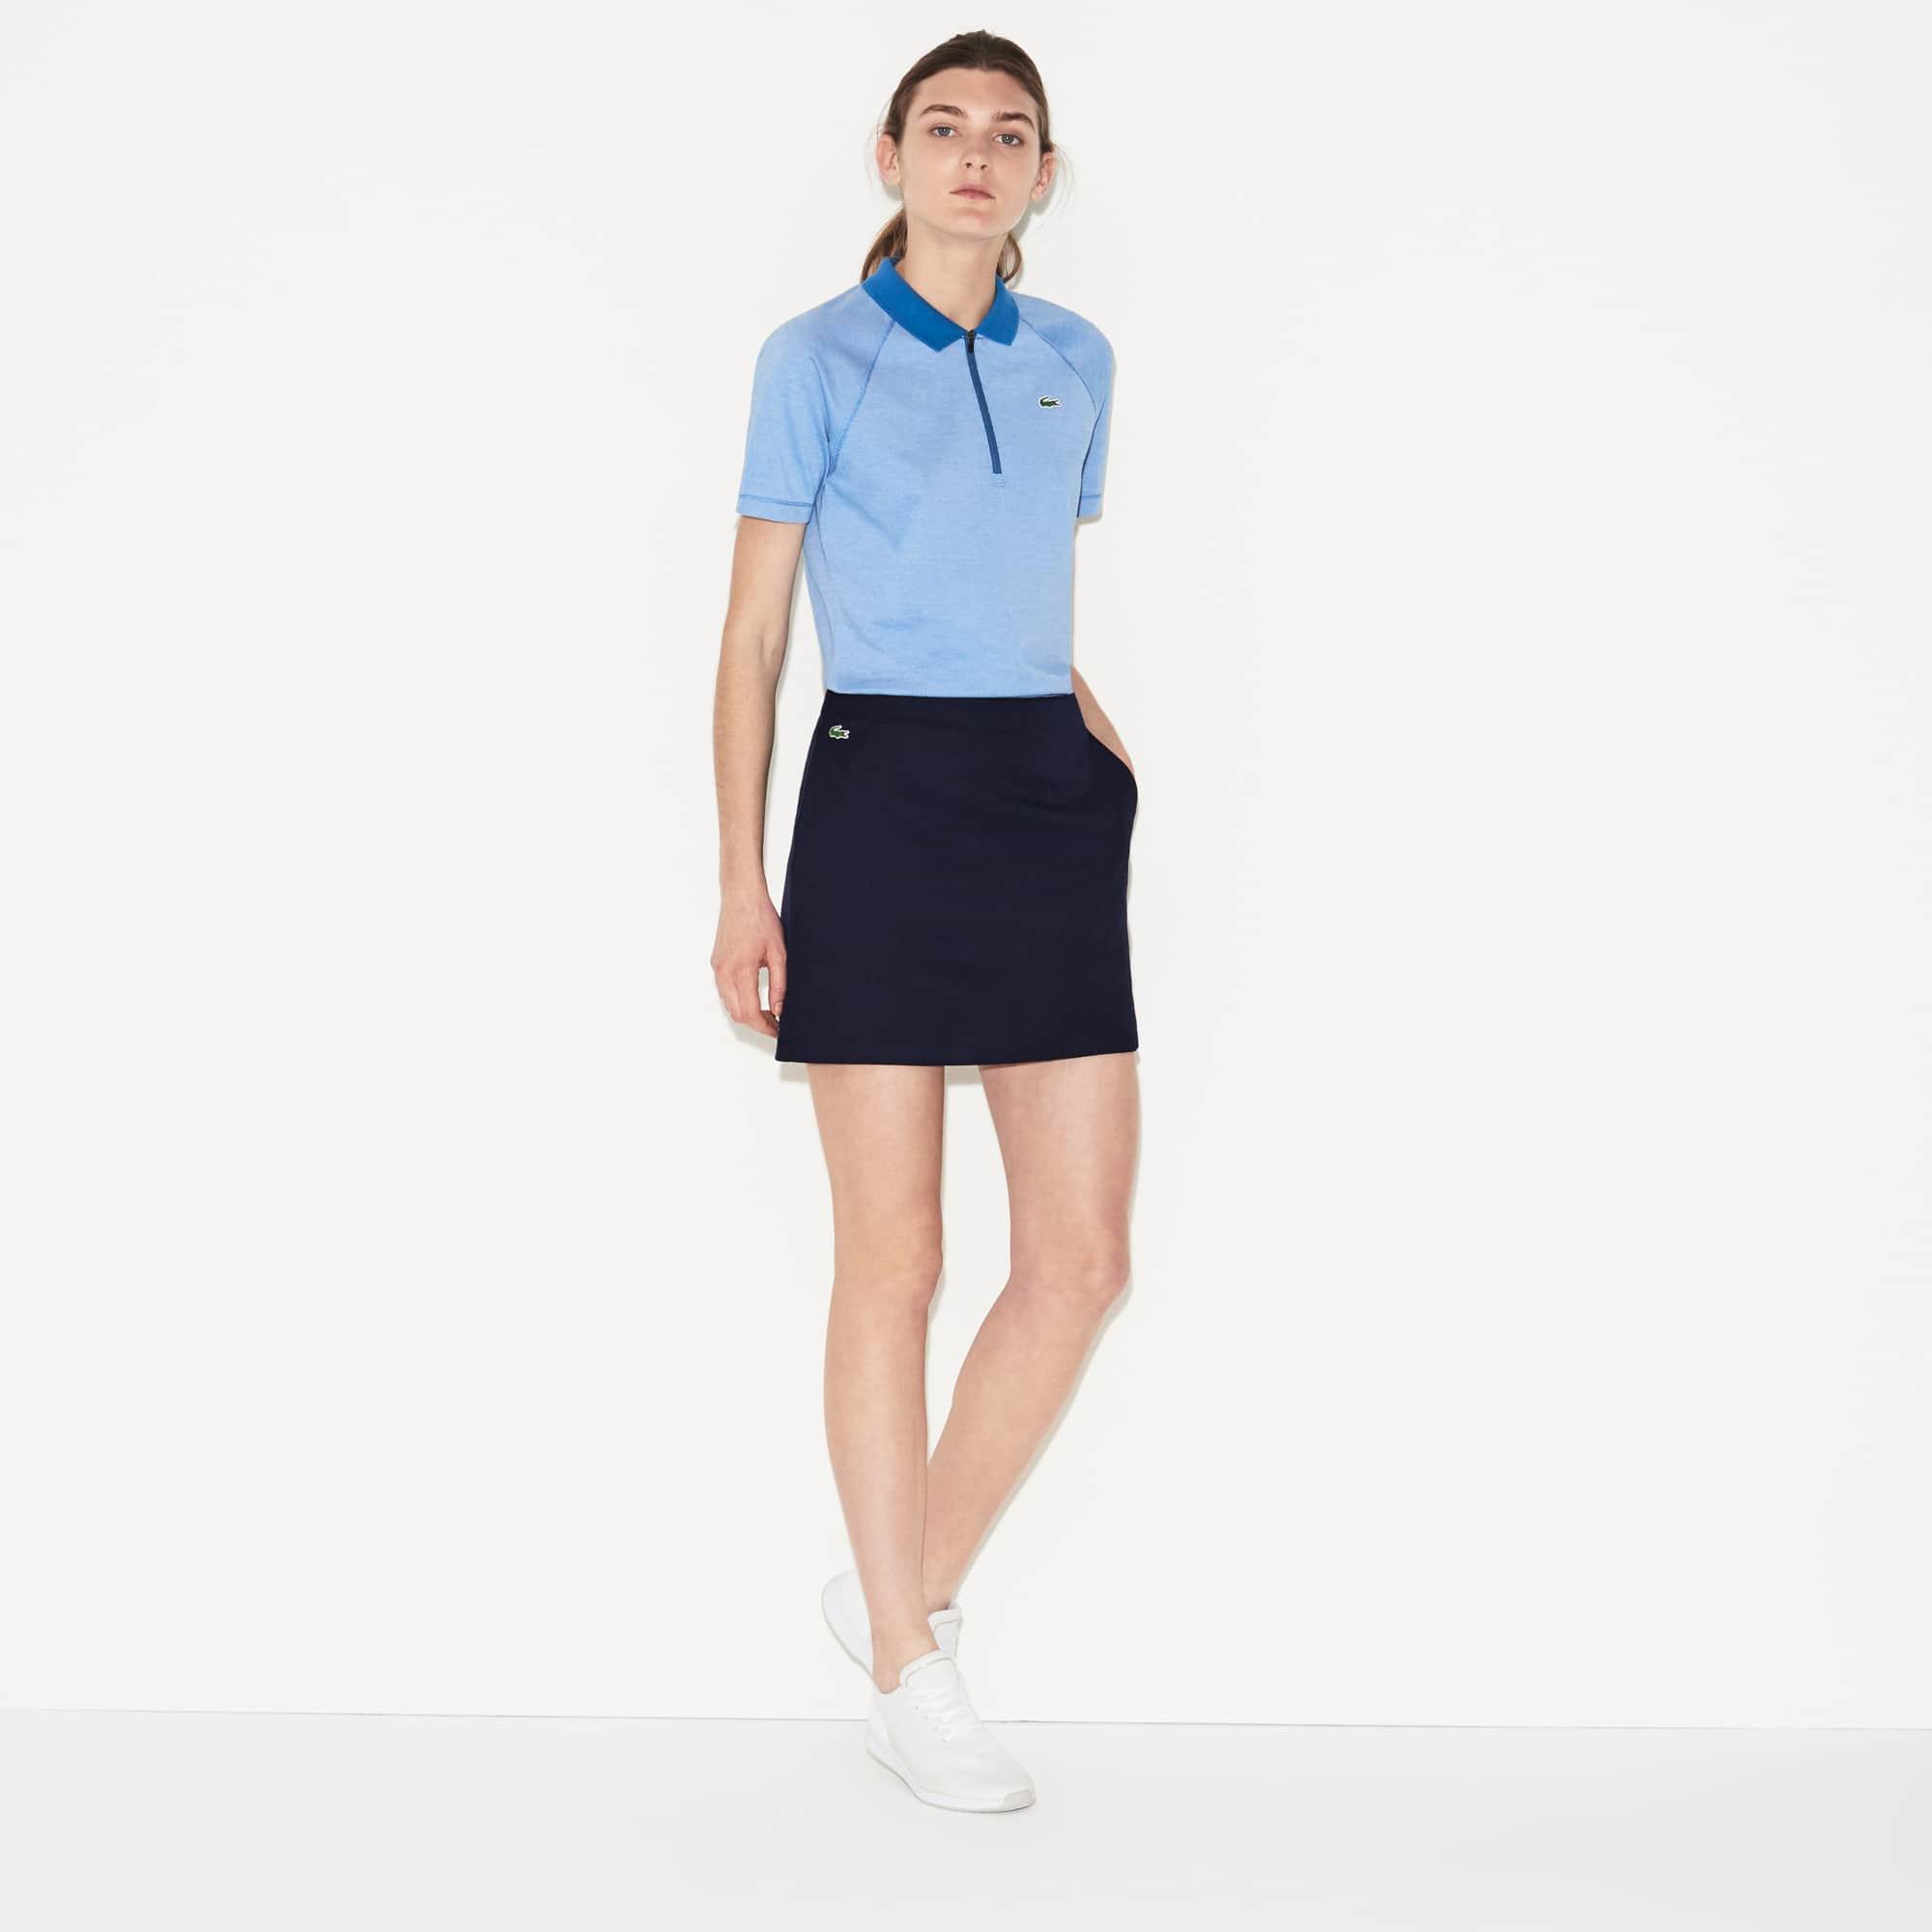 Lacoste SPORT Golf-rok dames technische gabardine